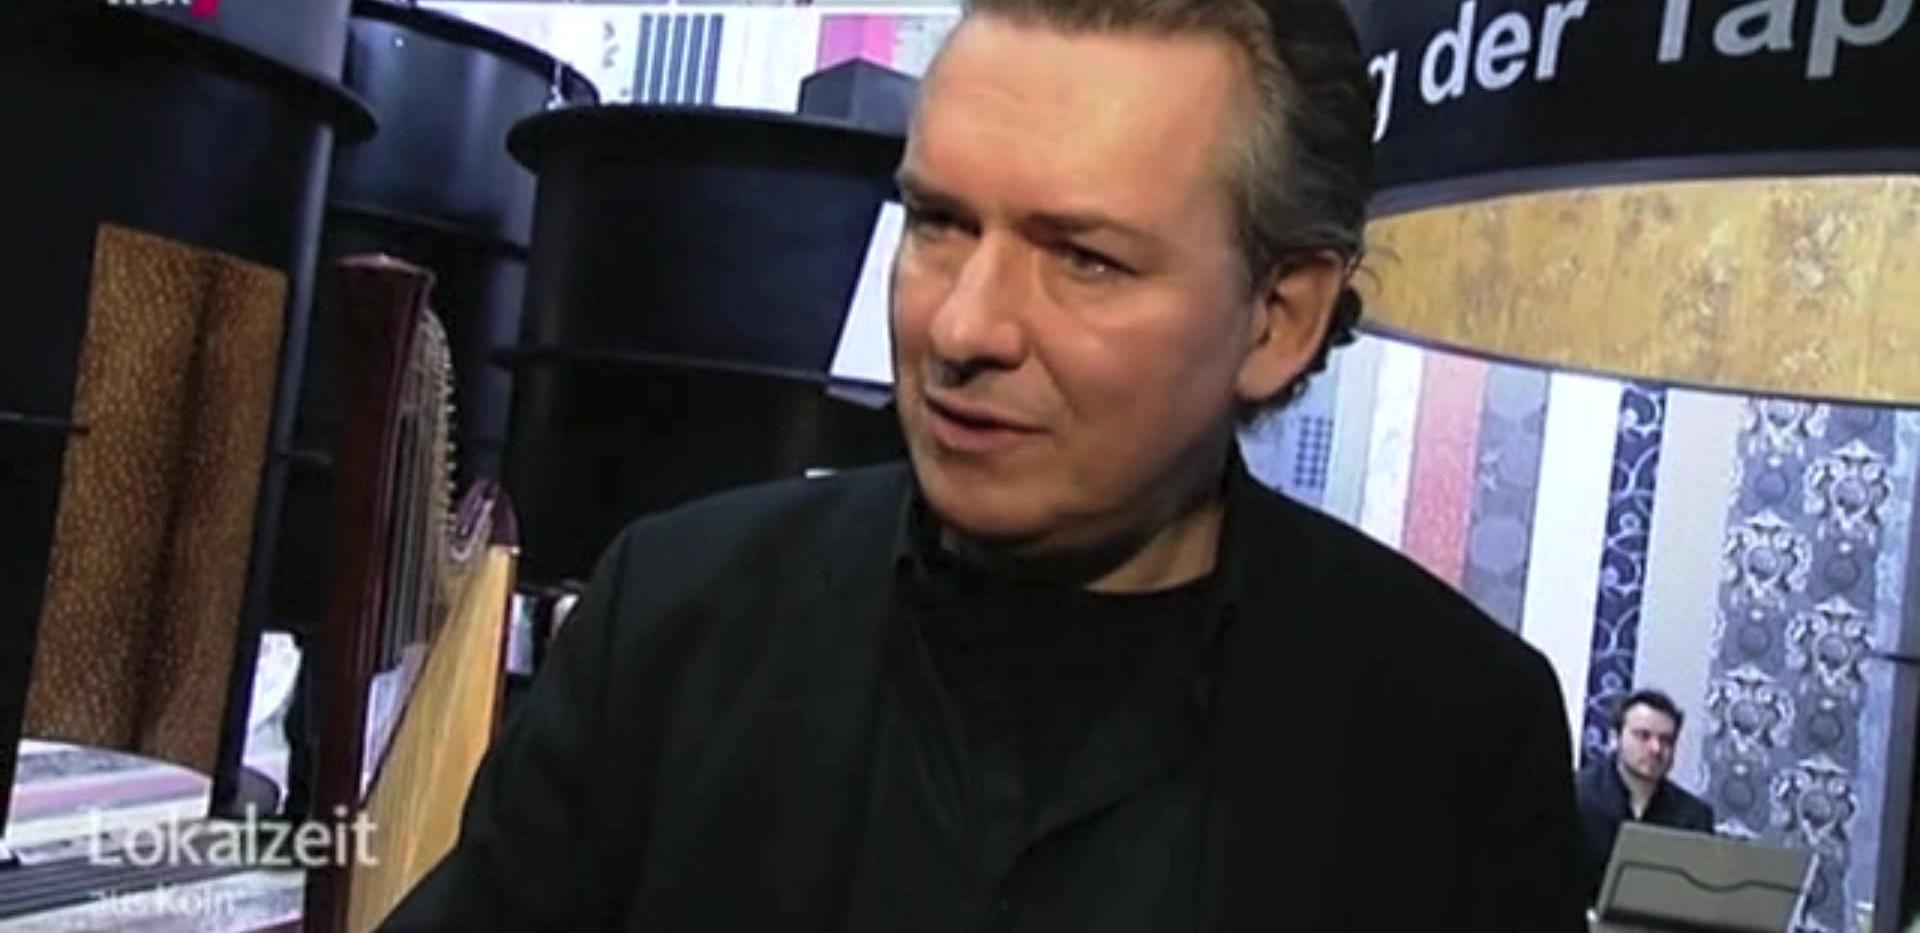 Tapeten-Interview.mov